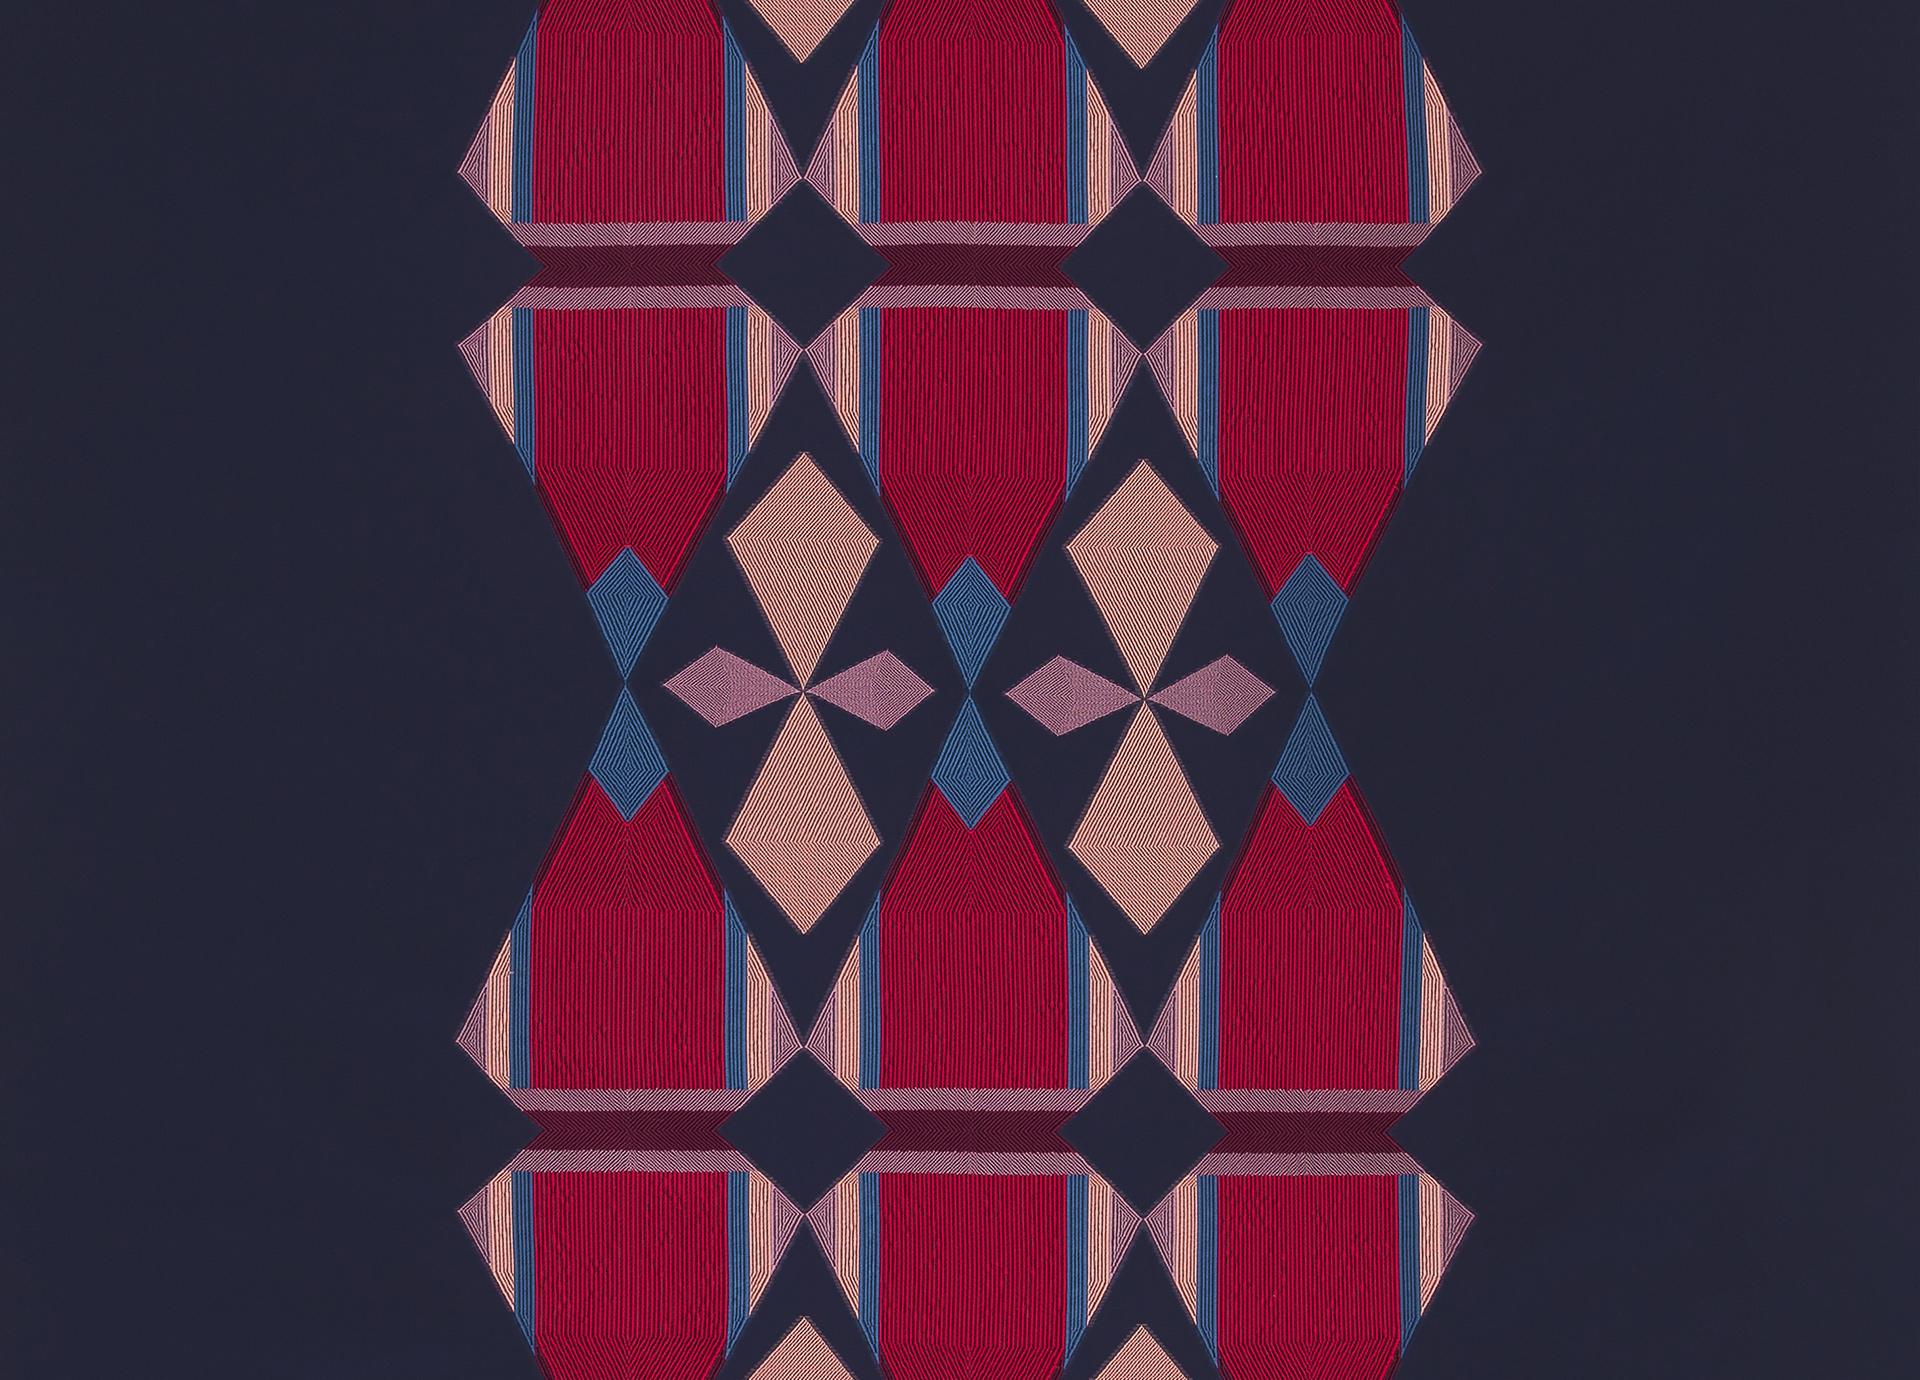 POIRET BLUE